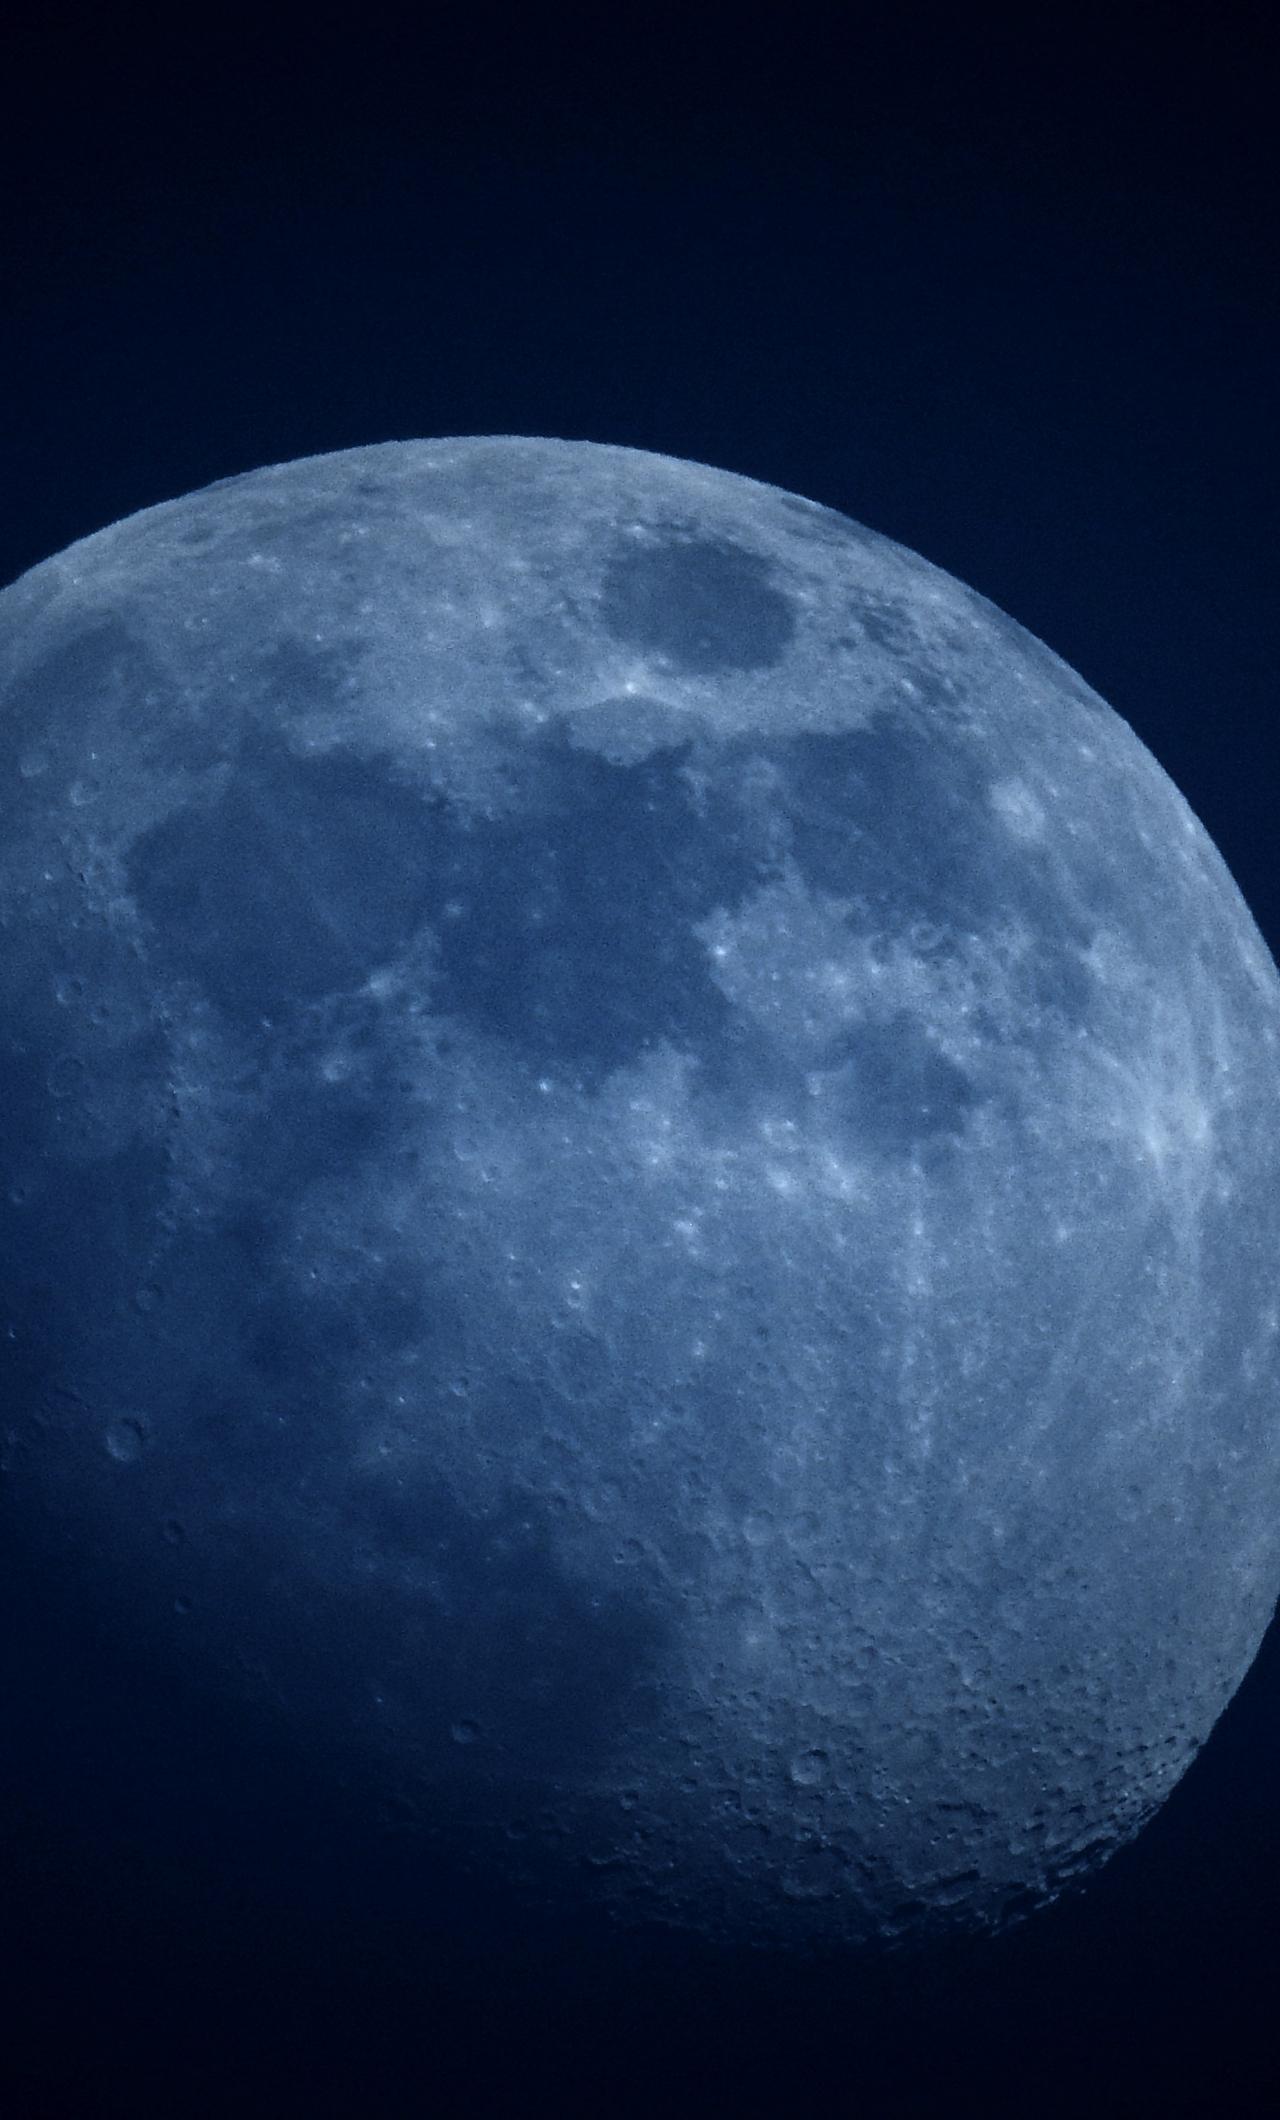 Download 1280x2120 Wallpaper Moon Night Space Iphone 6